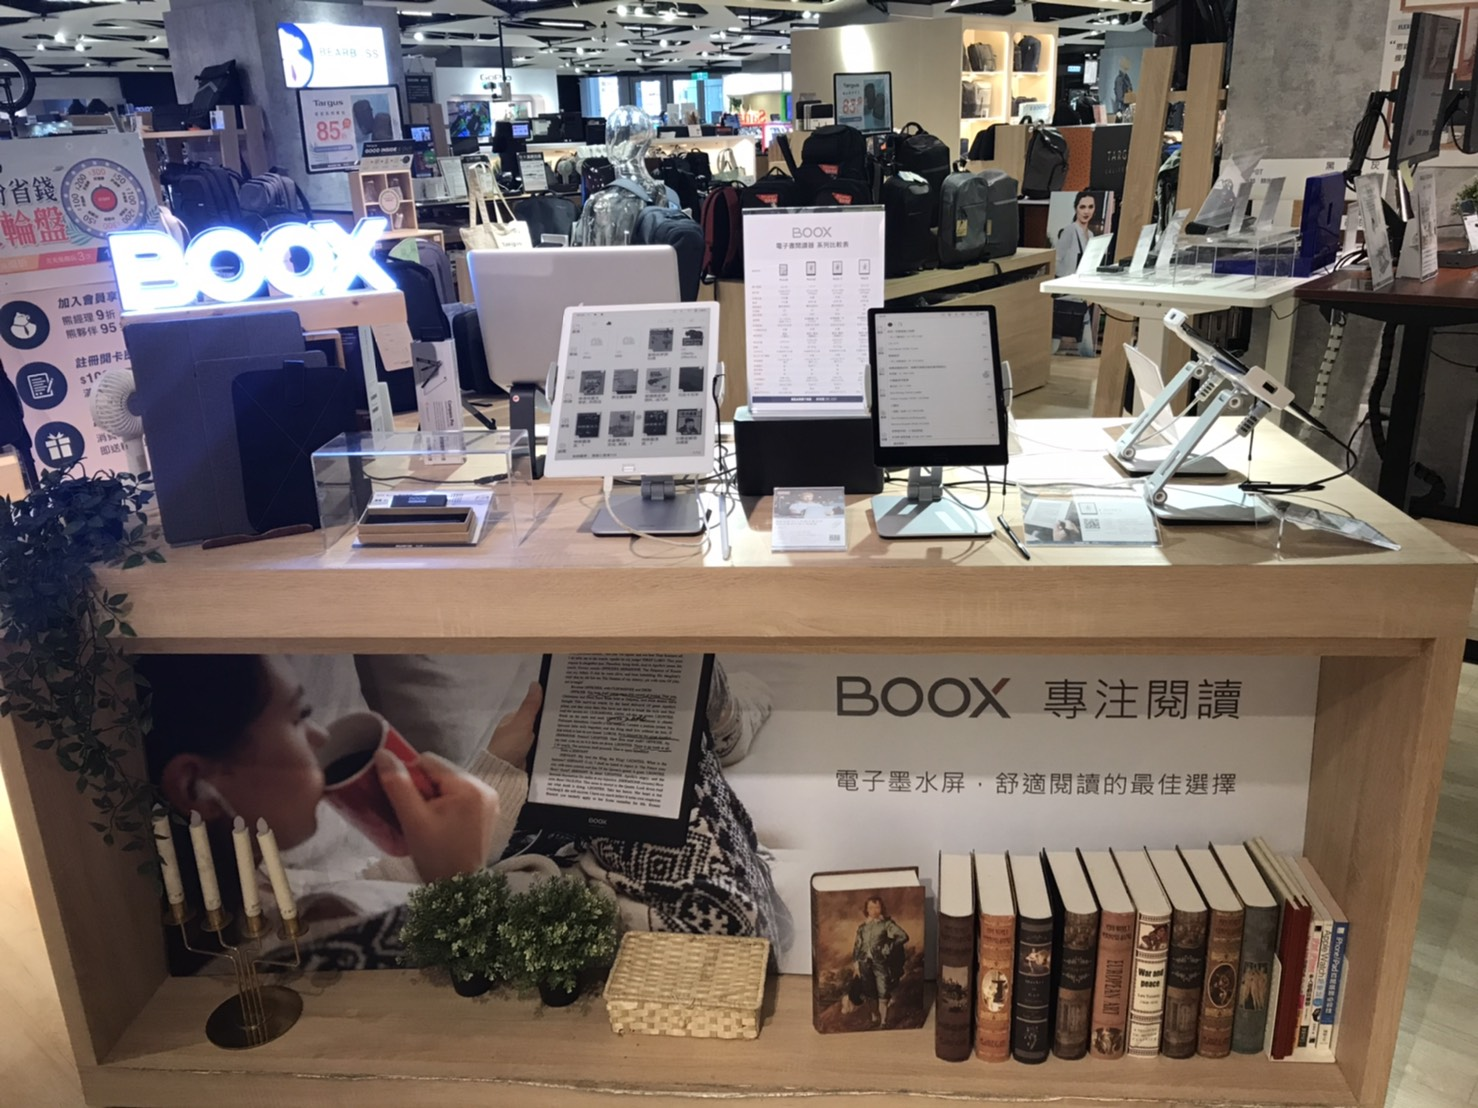 BOOX 文石電子閱讀器,體驗試用的實體門市